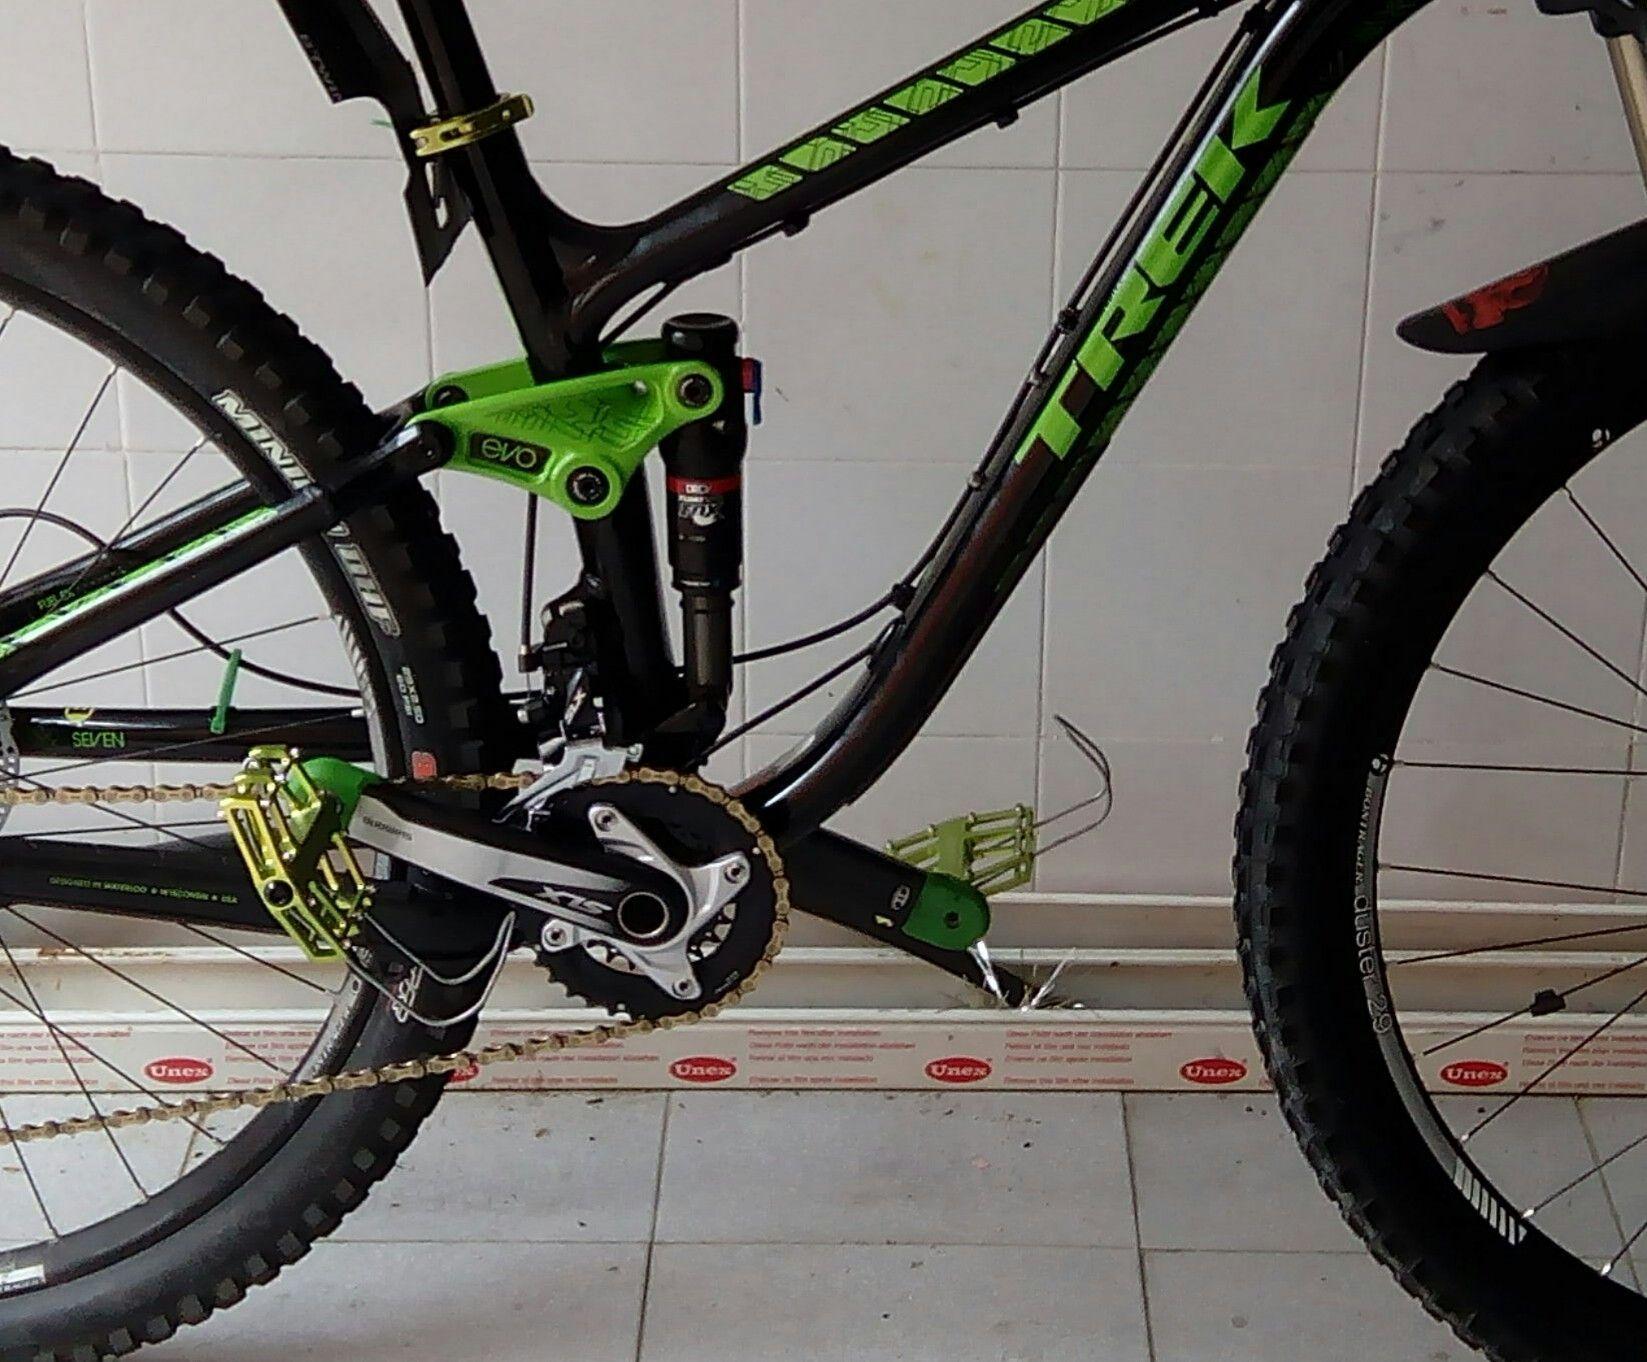 Bicicletas de doble suspensión (dobles) o bicicletas rígidas (simples)